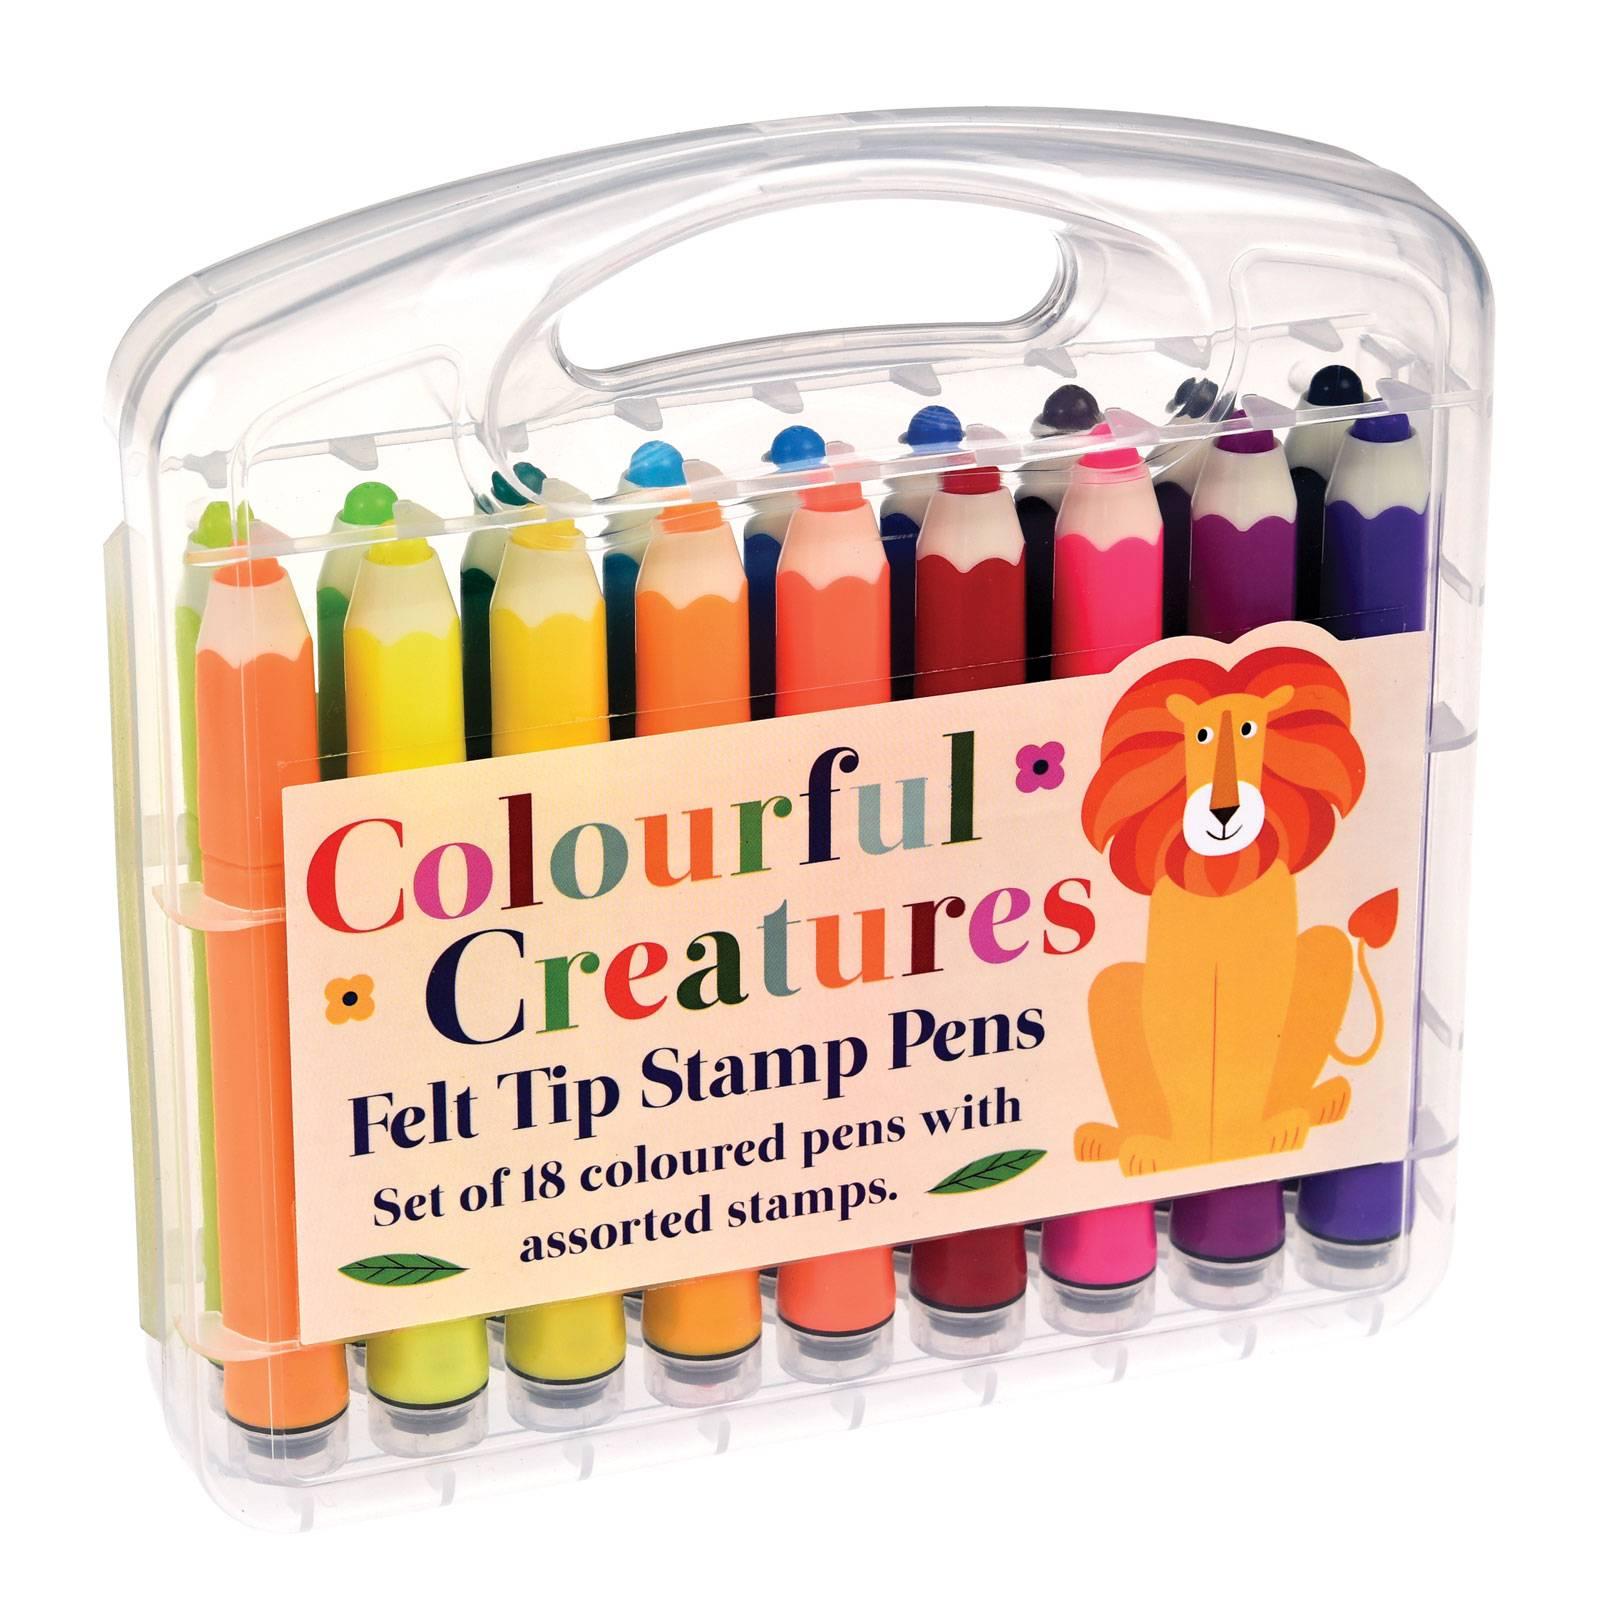 Colourful Creatures Felt Tip Stamp Pens